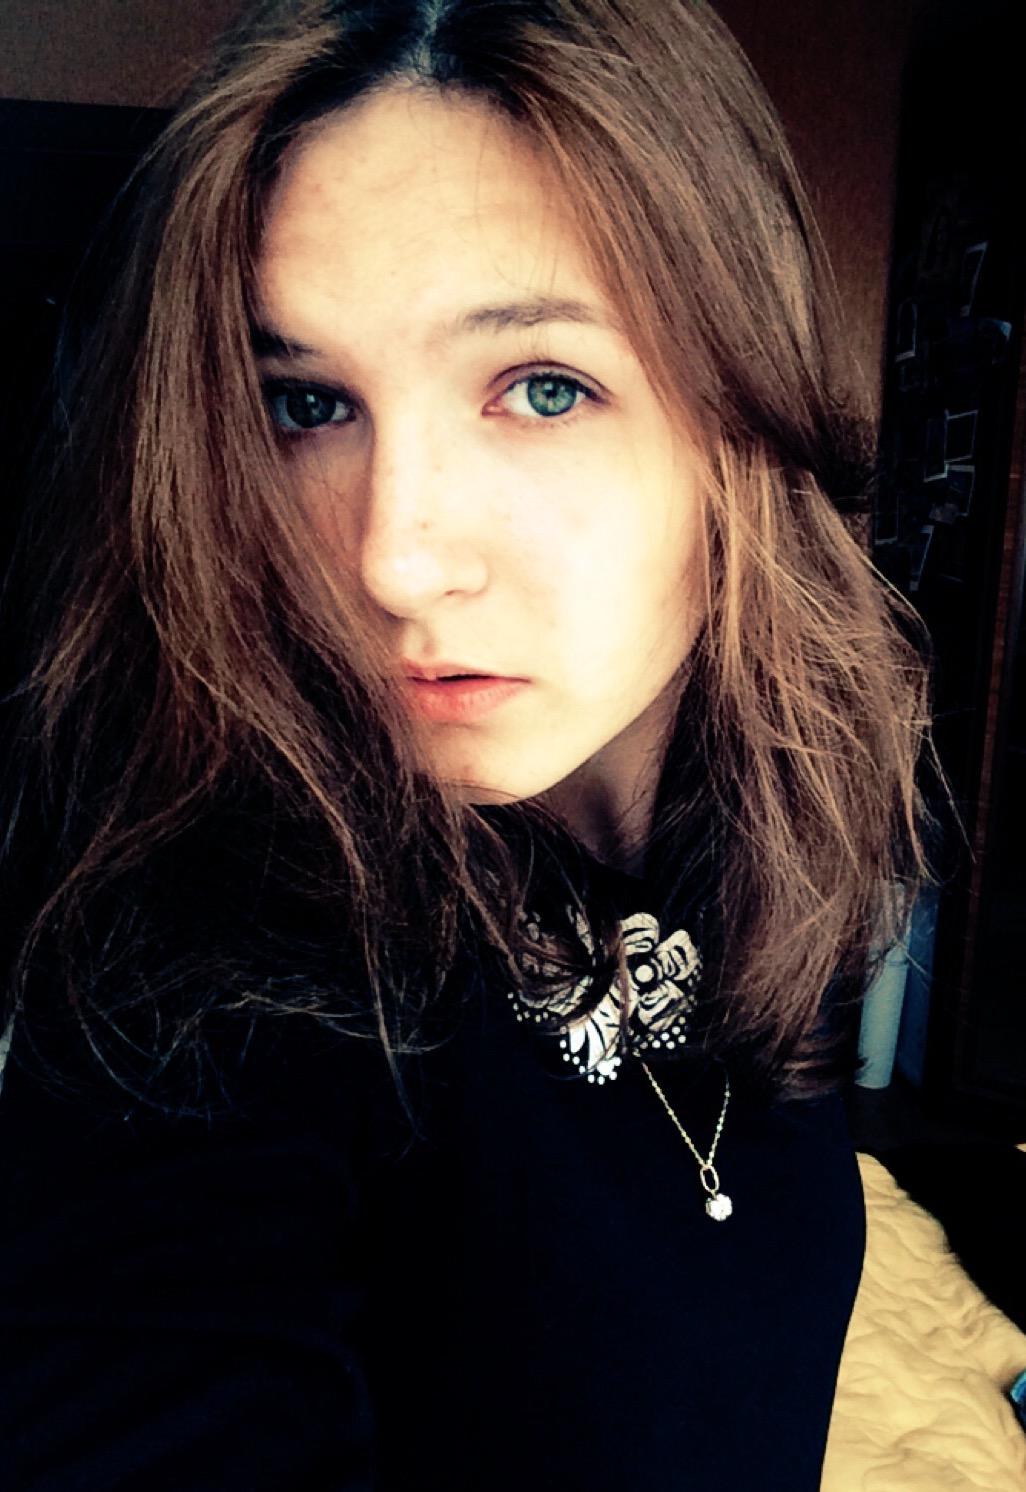 Юлия тихомирова фото 5 фотография